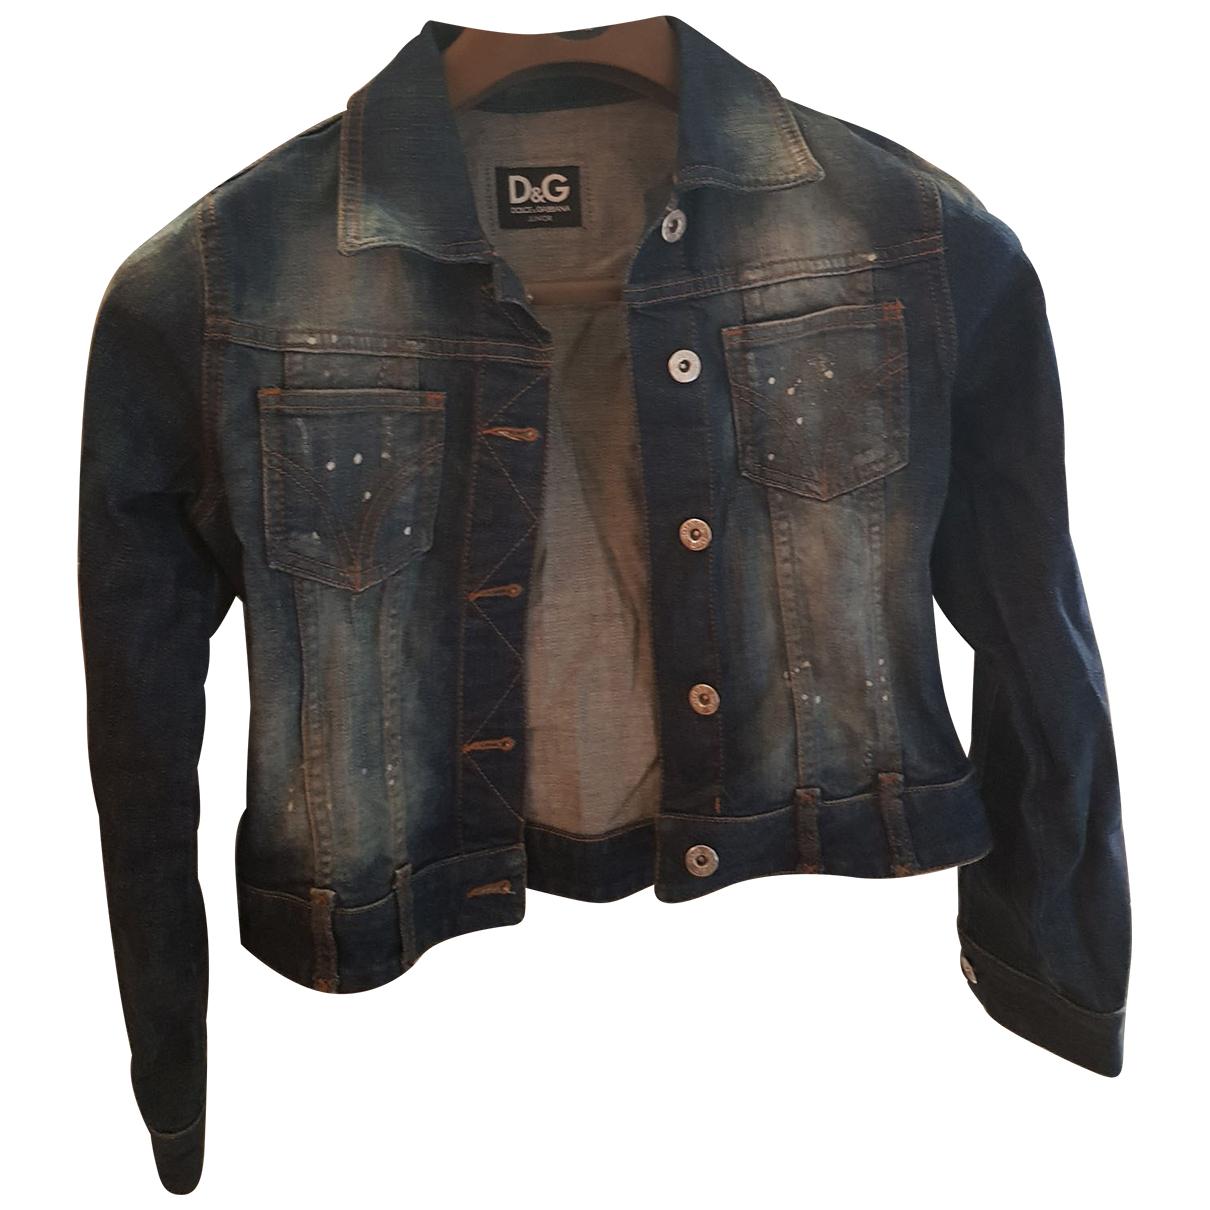 D&g \N Blue Denim - Jeans jacket & coat for Kids 12 years - XS FR